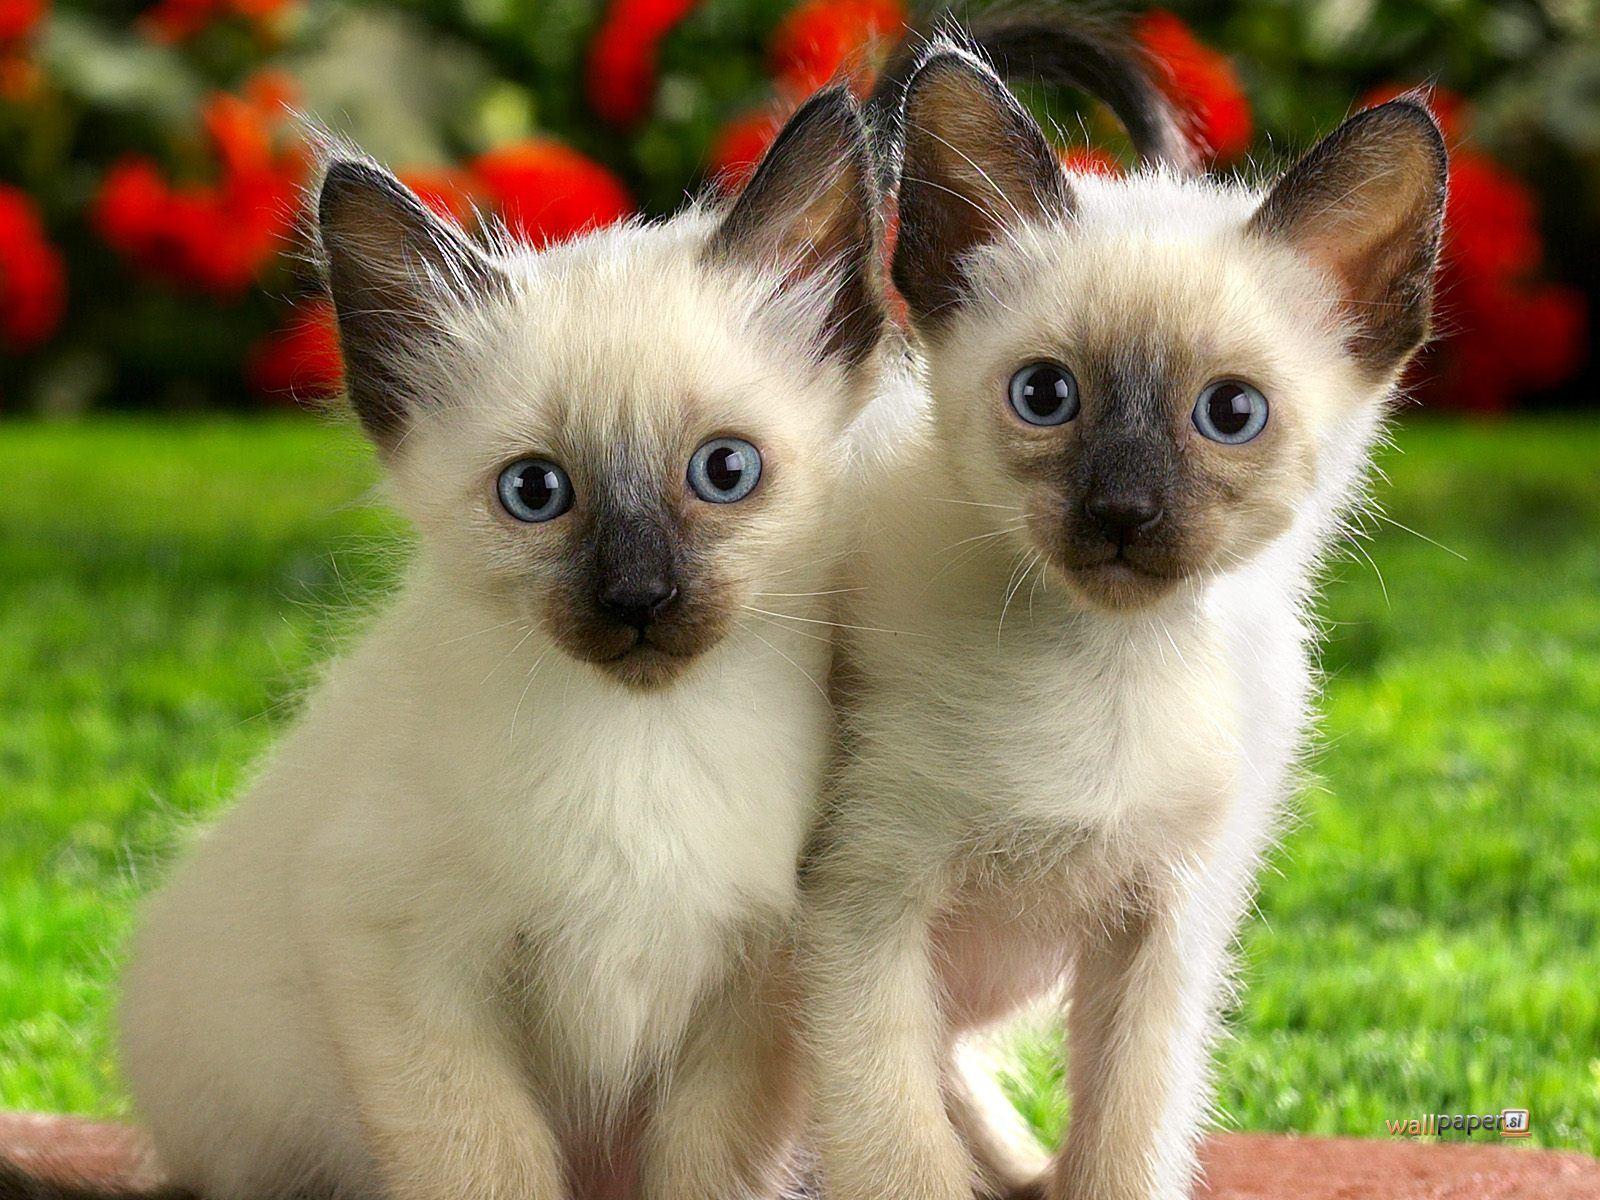 Ultimate Cheat Sheet Siamese Cat Tips & Tricks